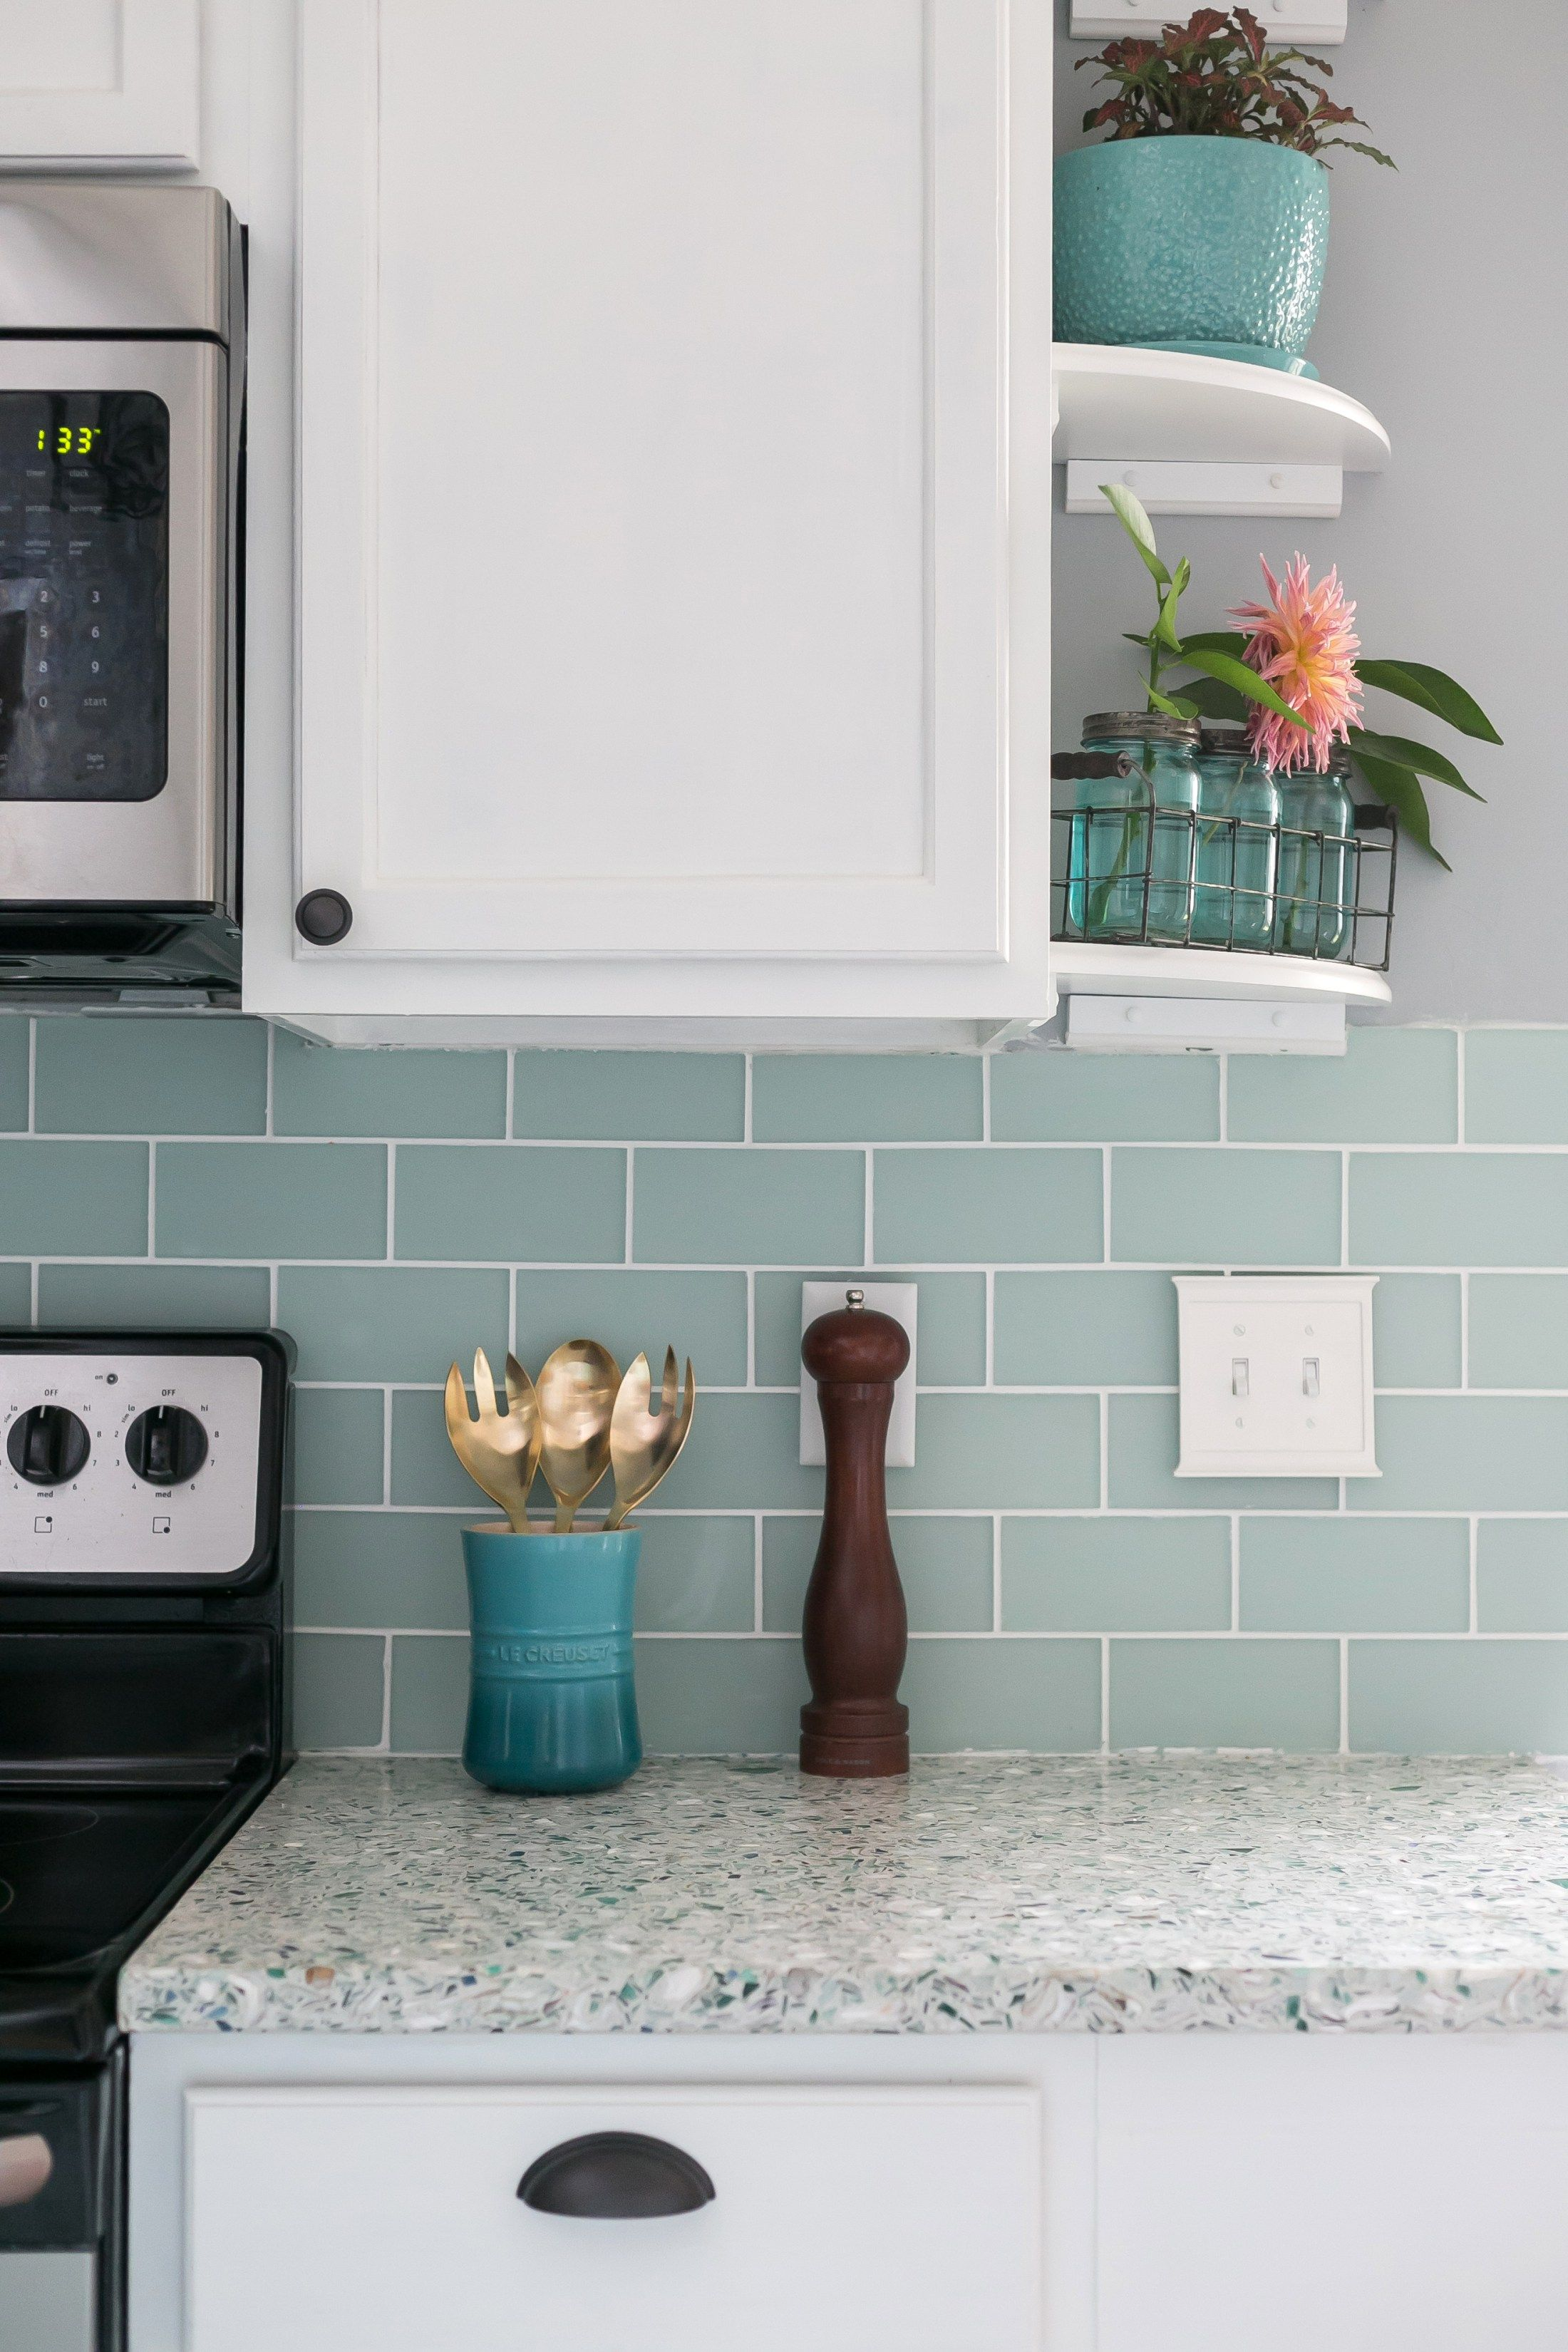 Fancy The Green Kitchen Motif - Best Kitchen Ideas - i-contain.com